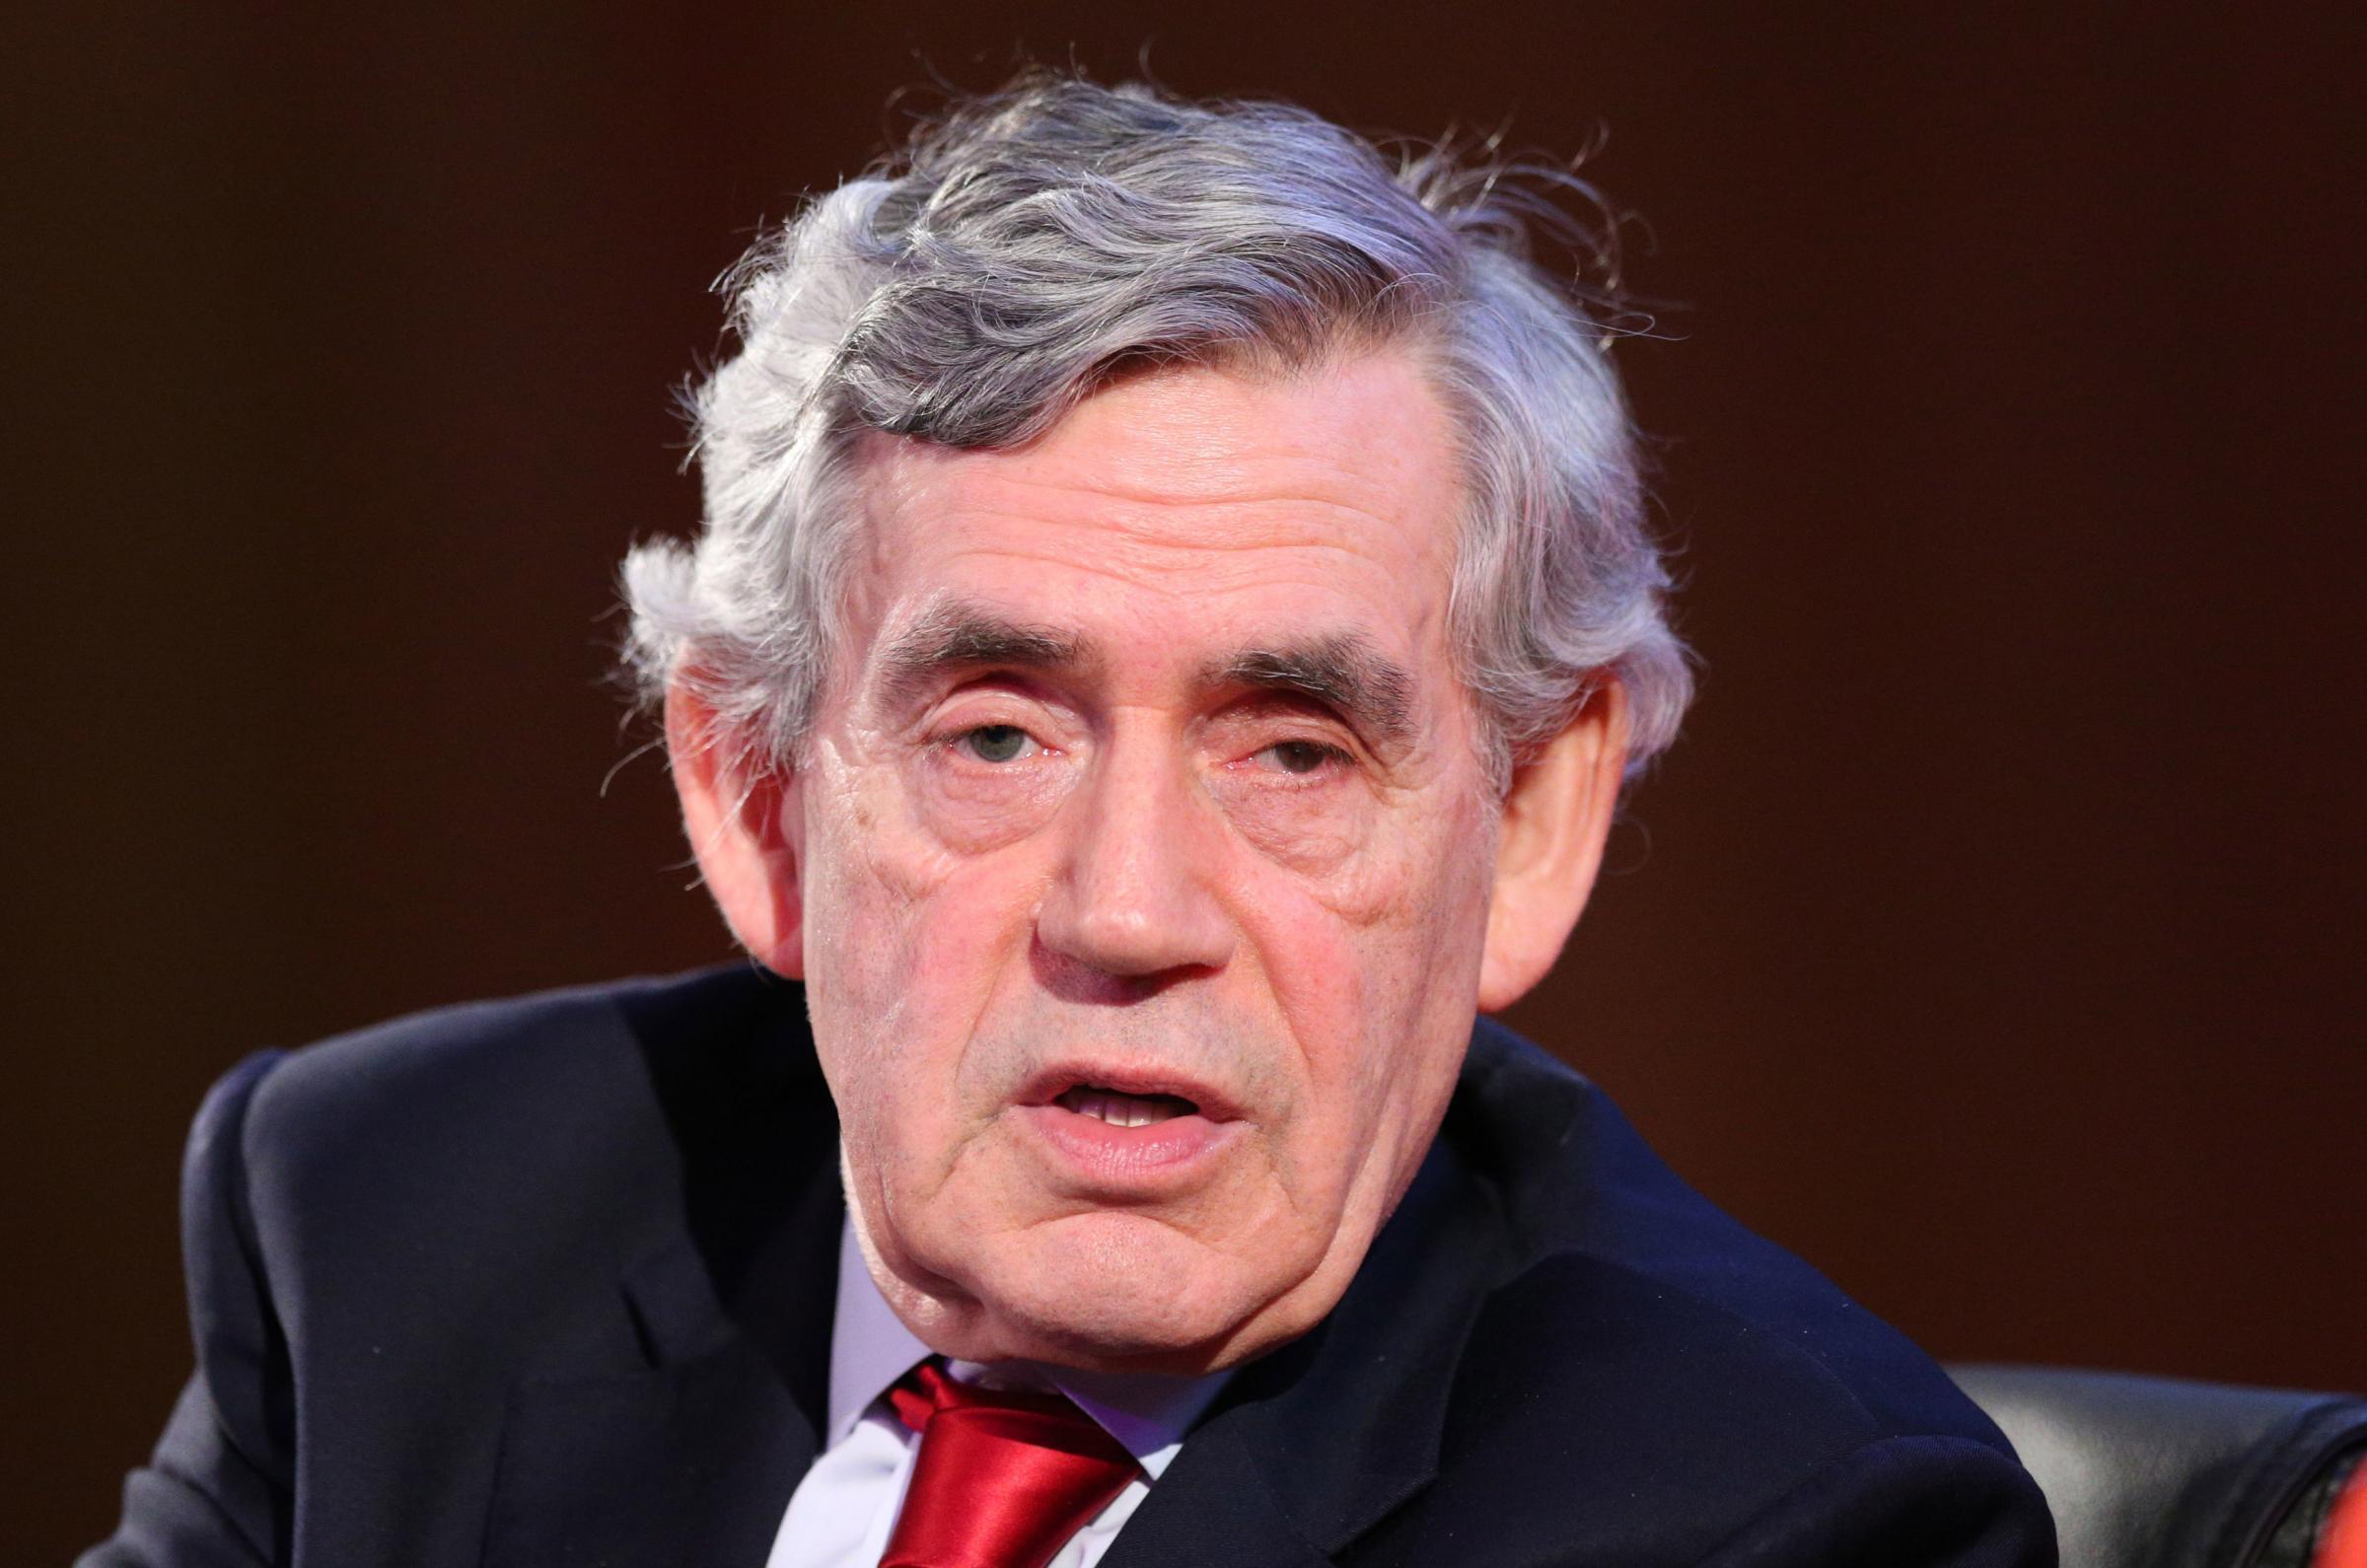 Gordon Brown attacks Boris Johnson as narrow English Nationalist whose premiership would risk future of UK